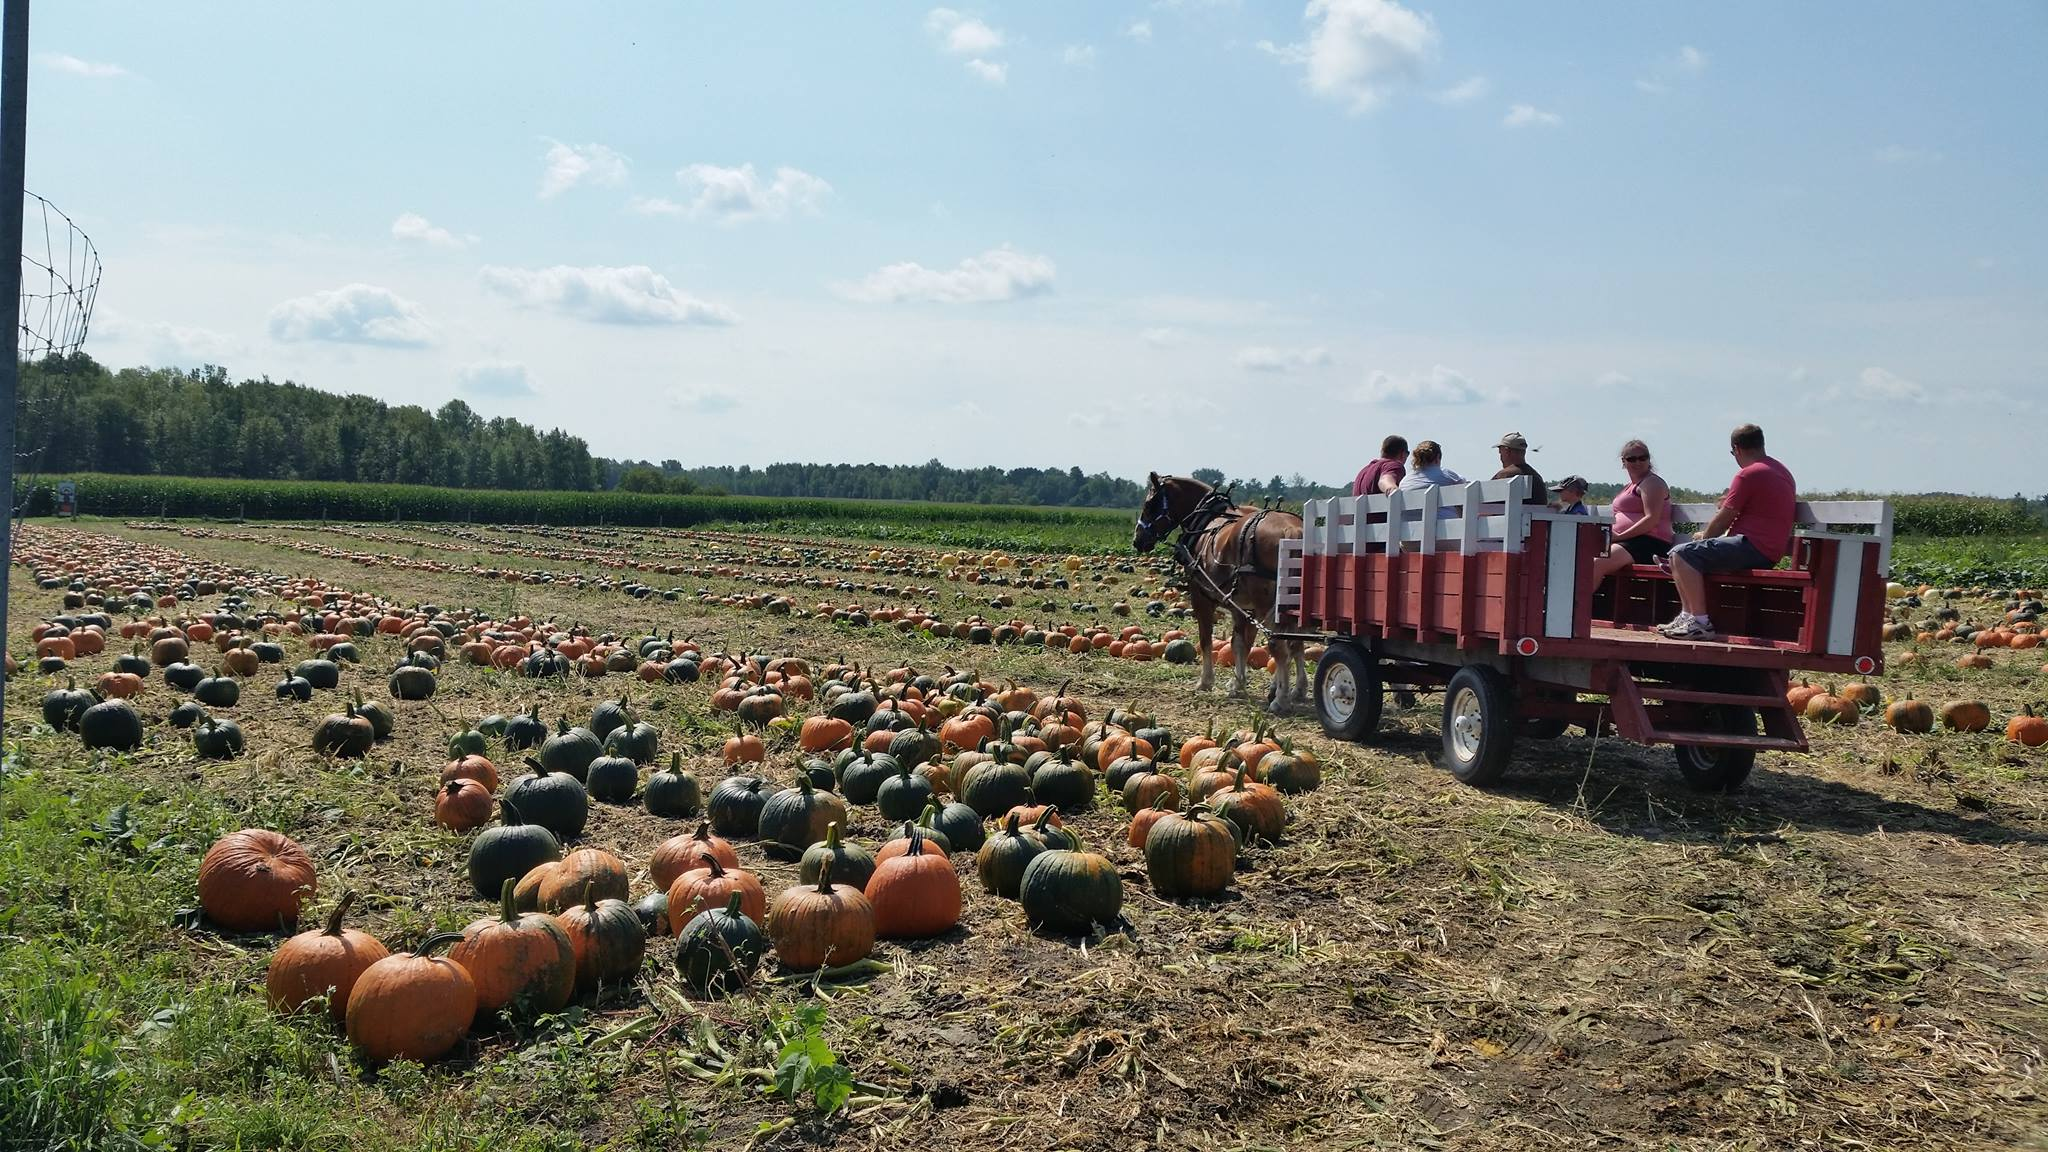 Horse carriage in pumpkin patch